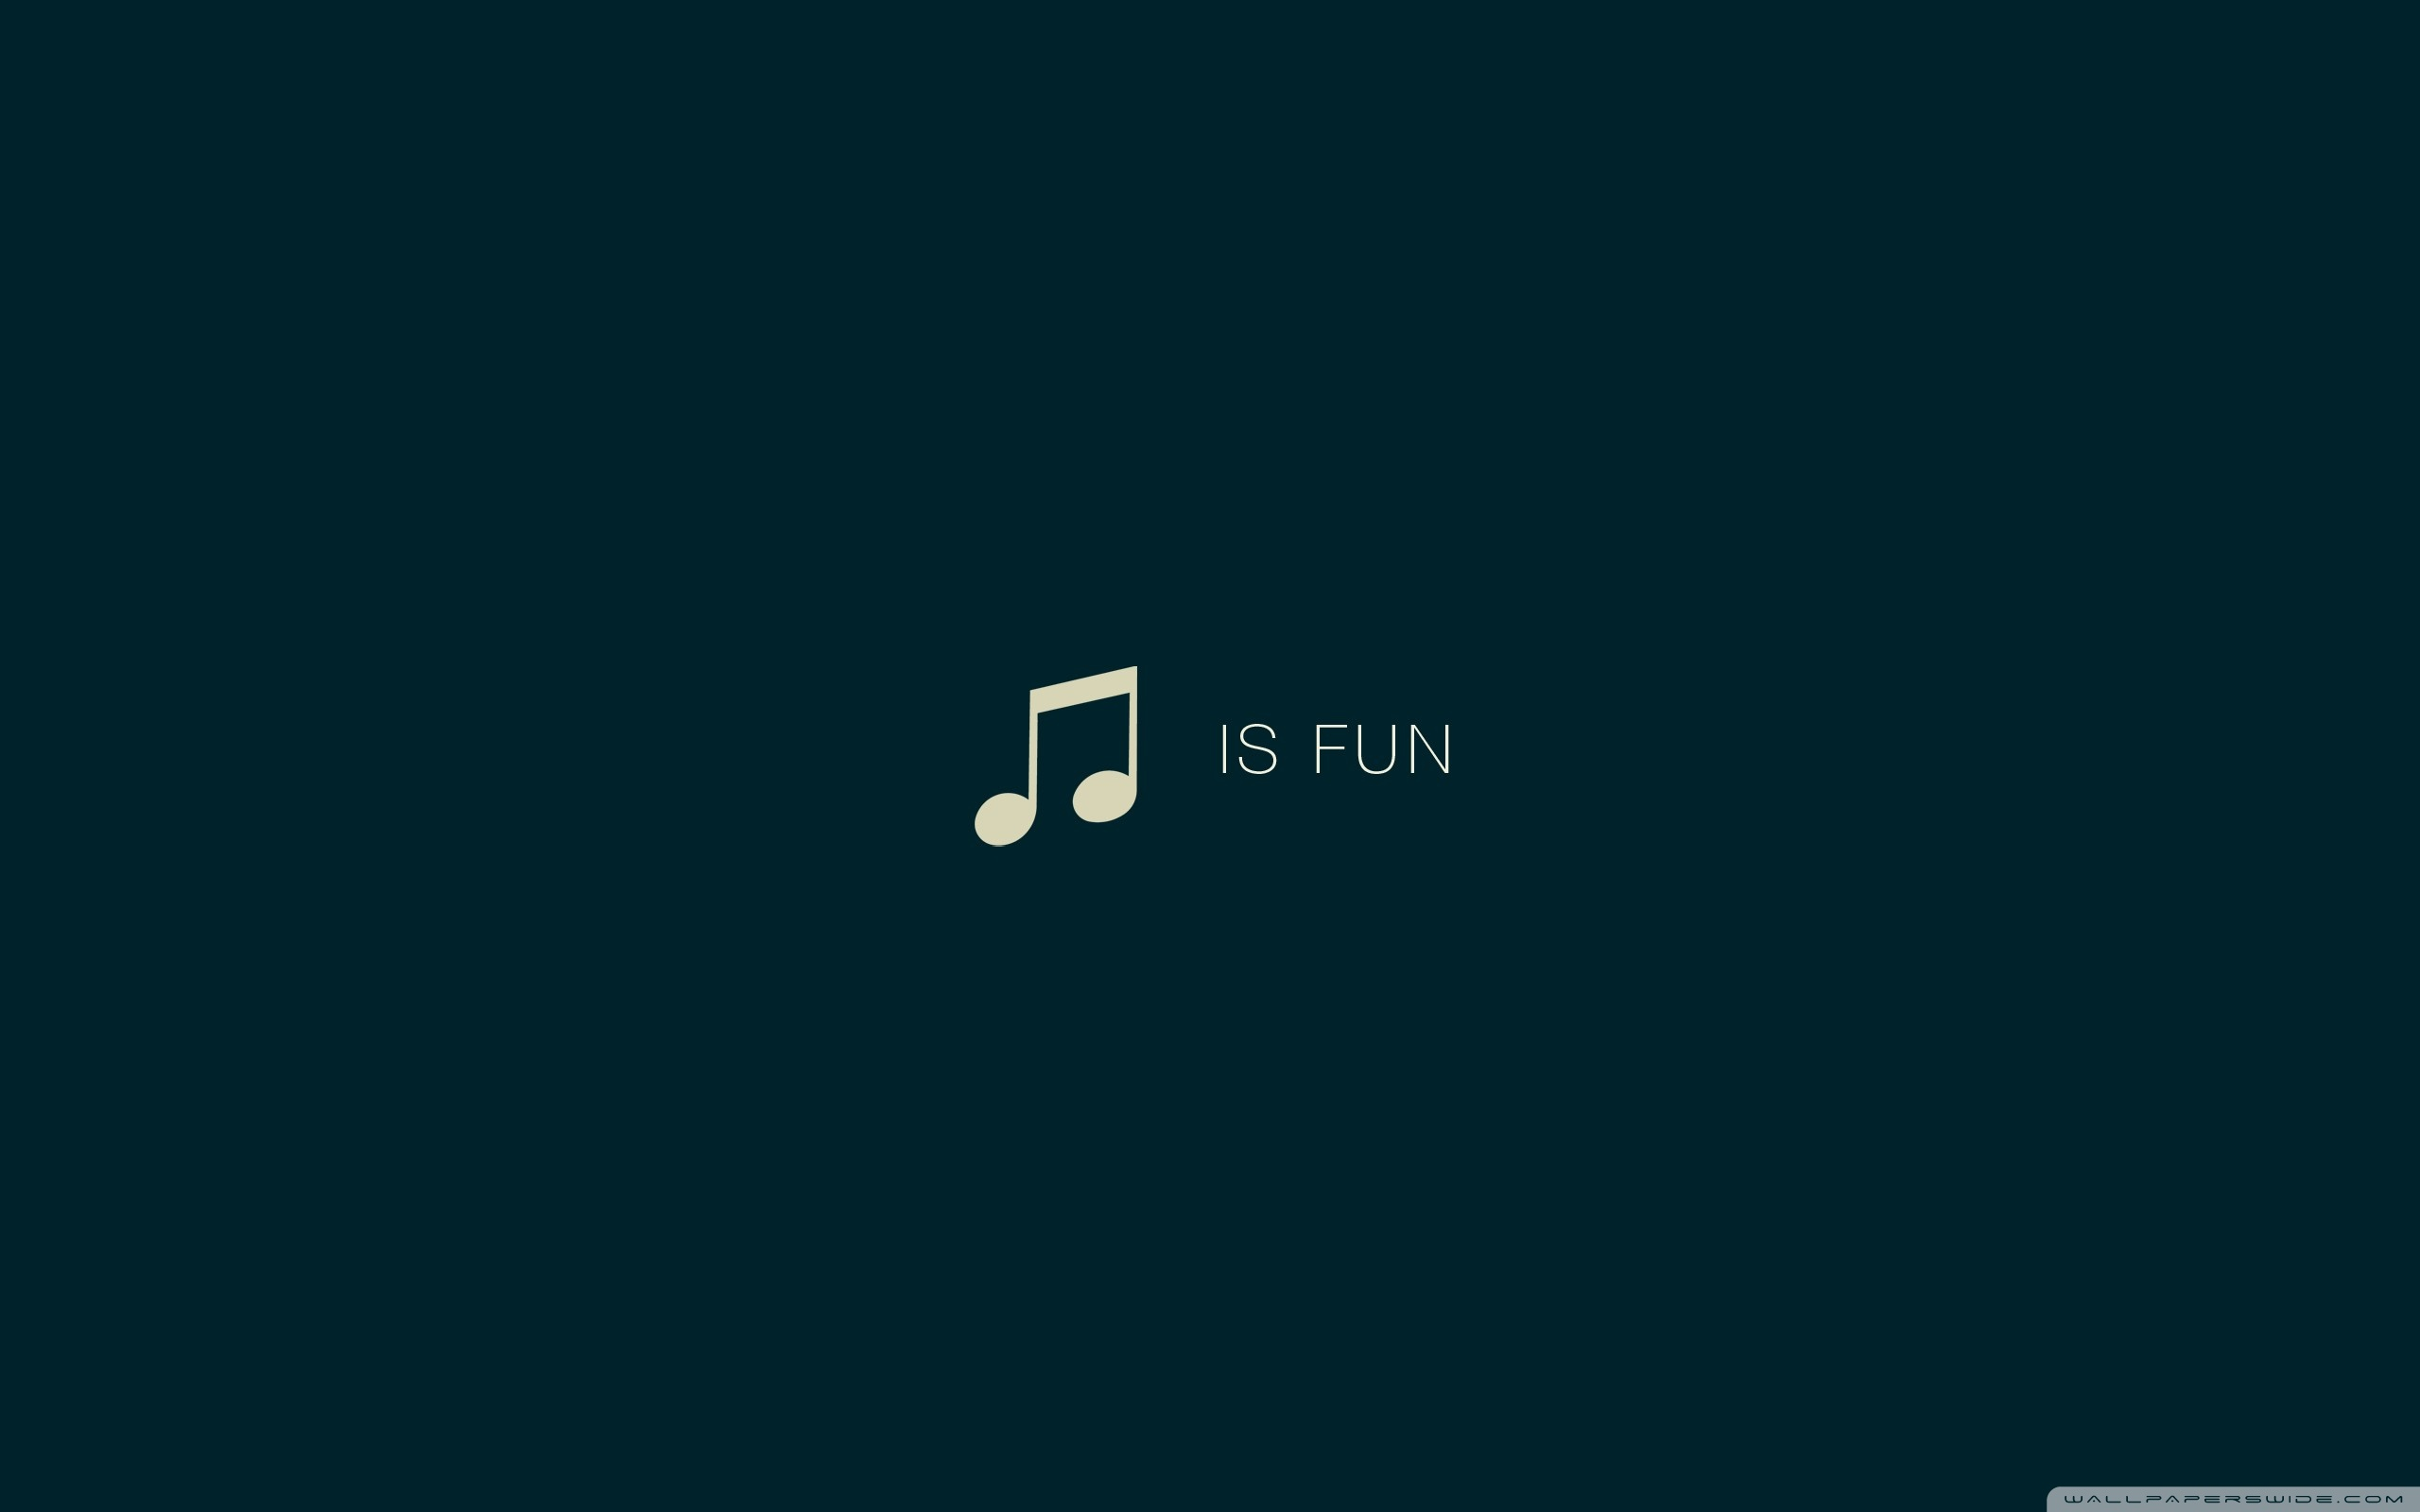 Fun Wallpaper 2560x1600 78889